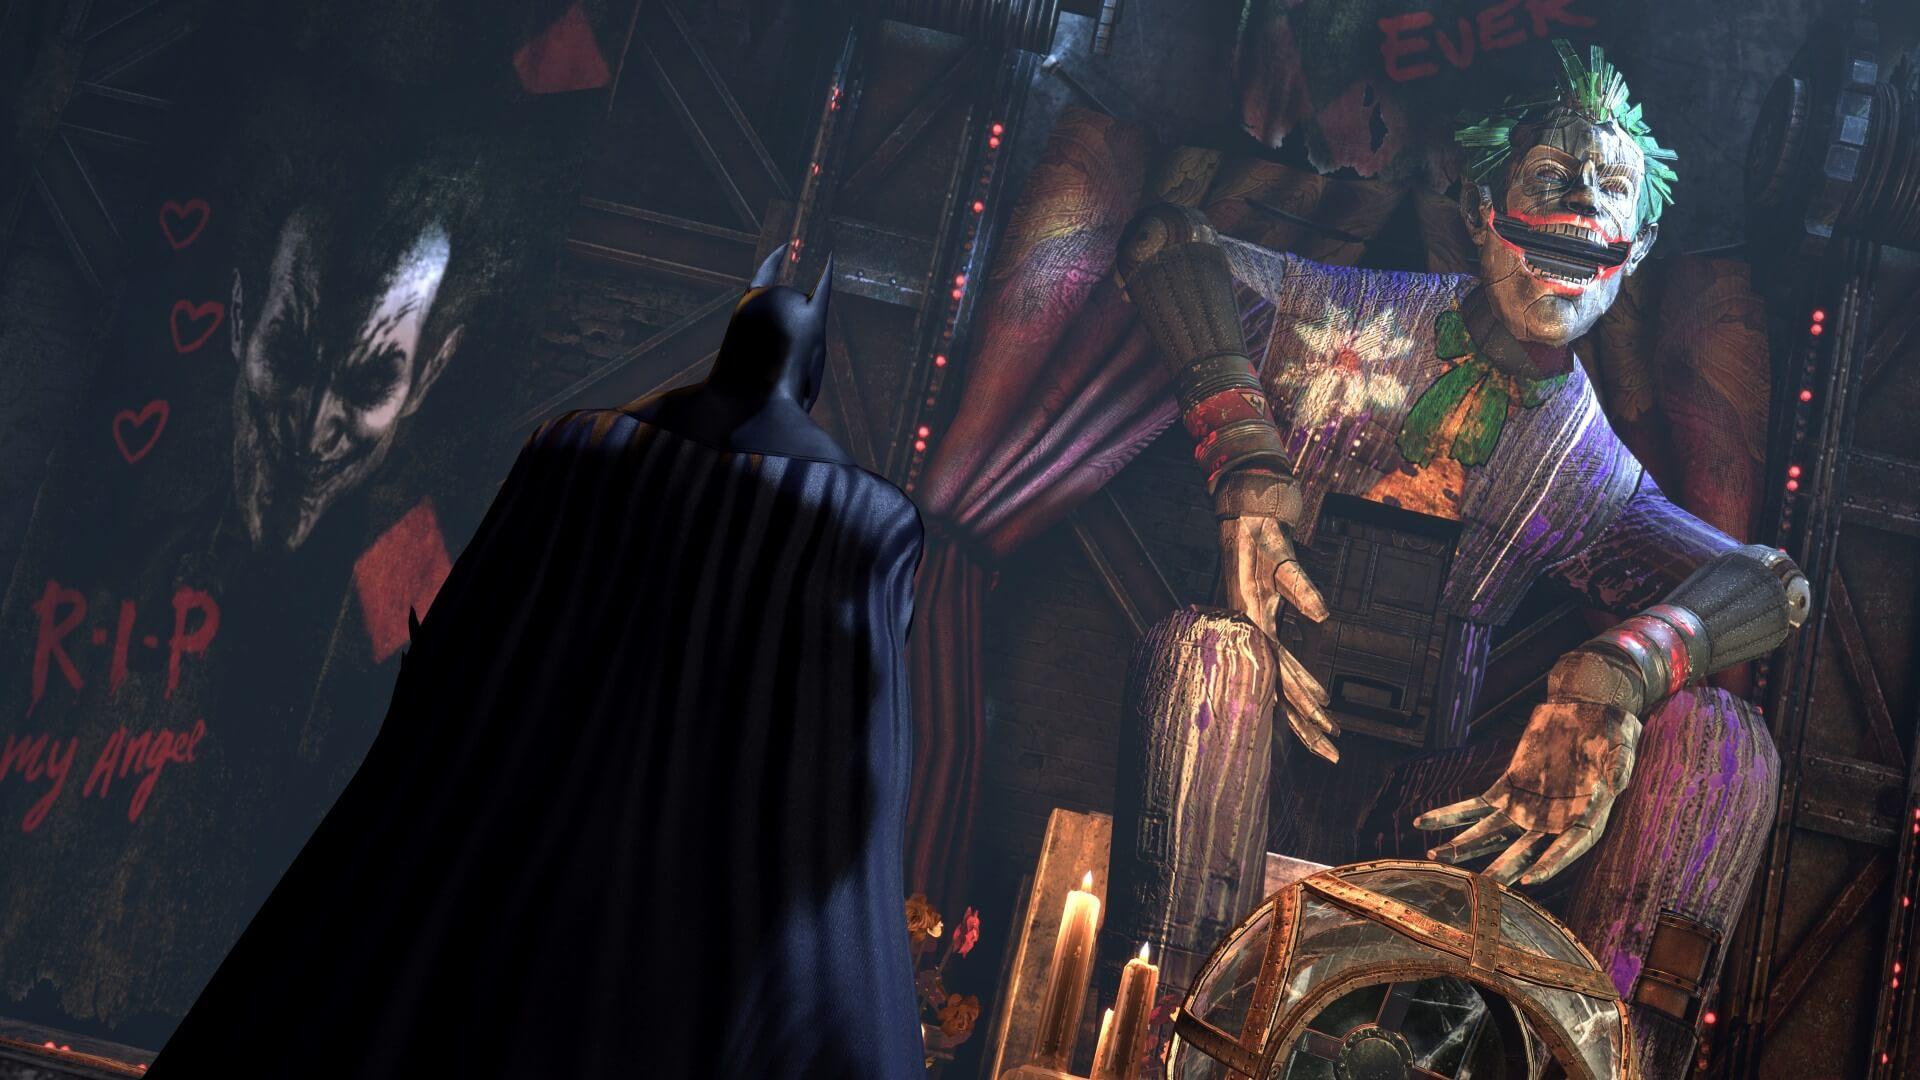 'Batman: Arkham City' DLC 'Harley Quinn's Revenge' Trailer & Screenshots